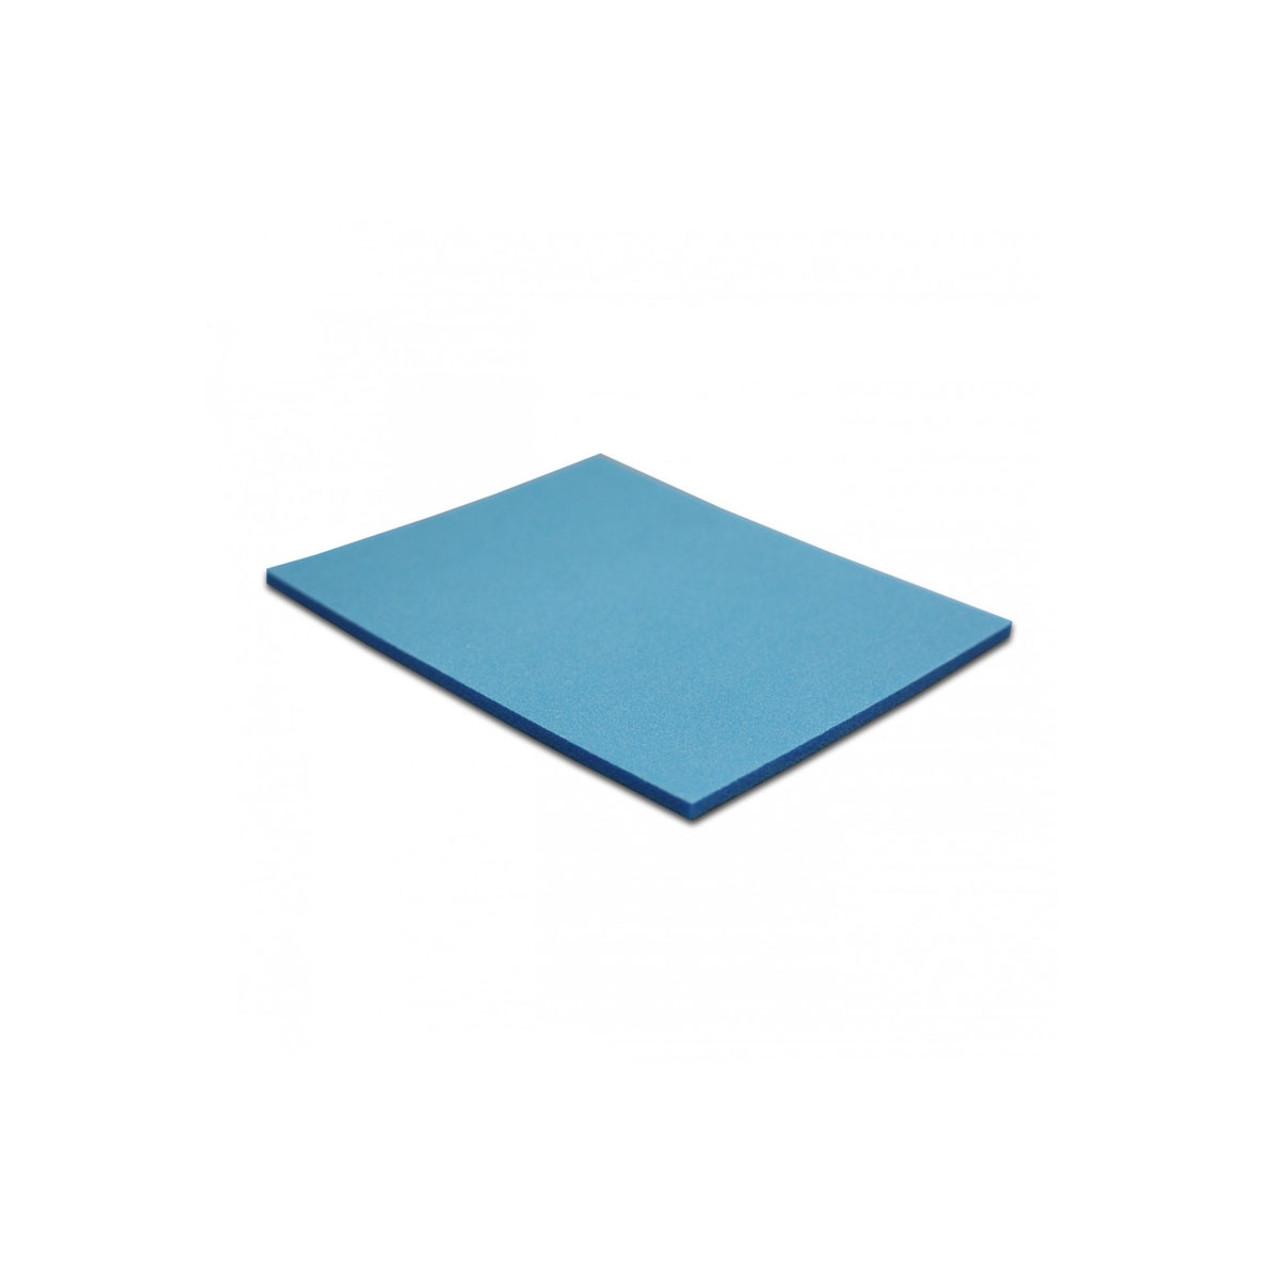 Sanding Pad - 800 Grit